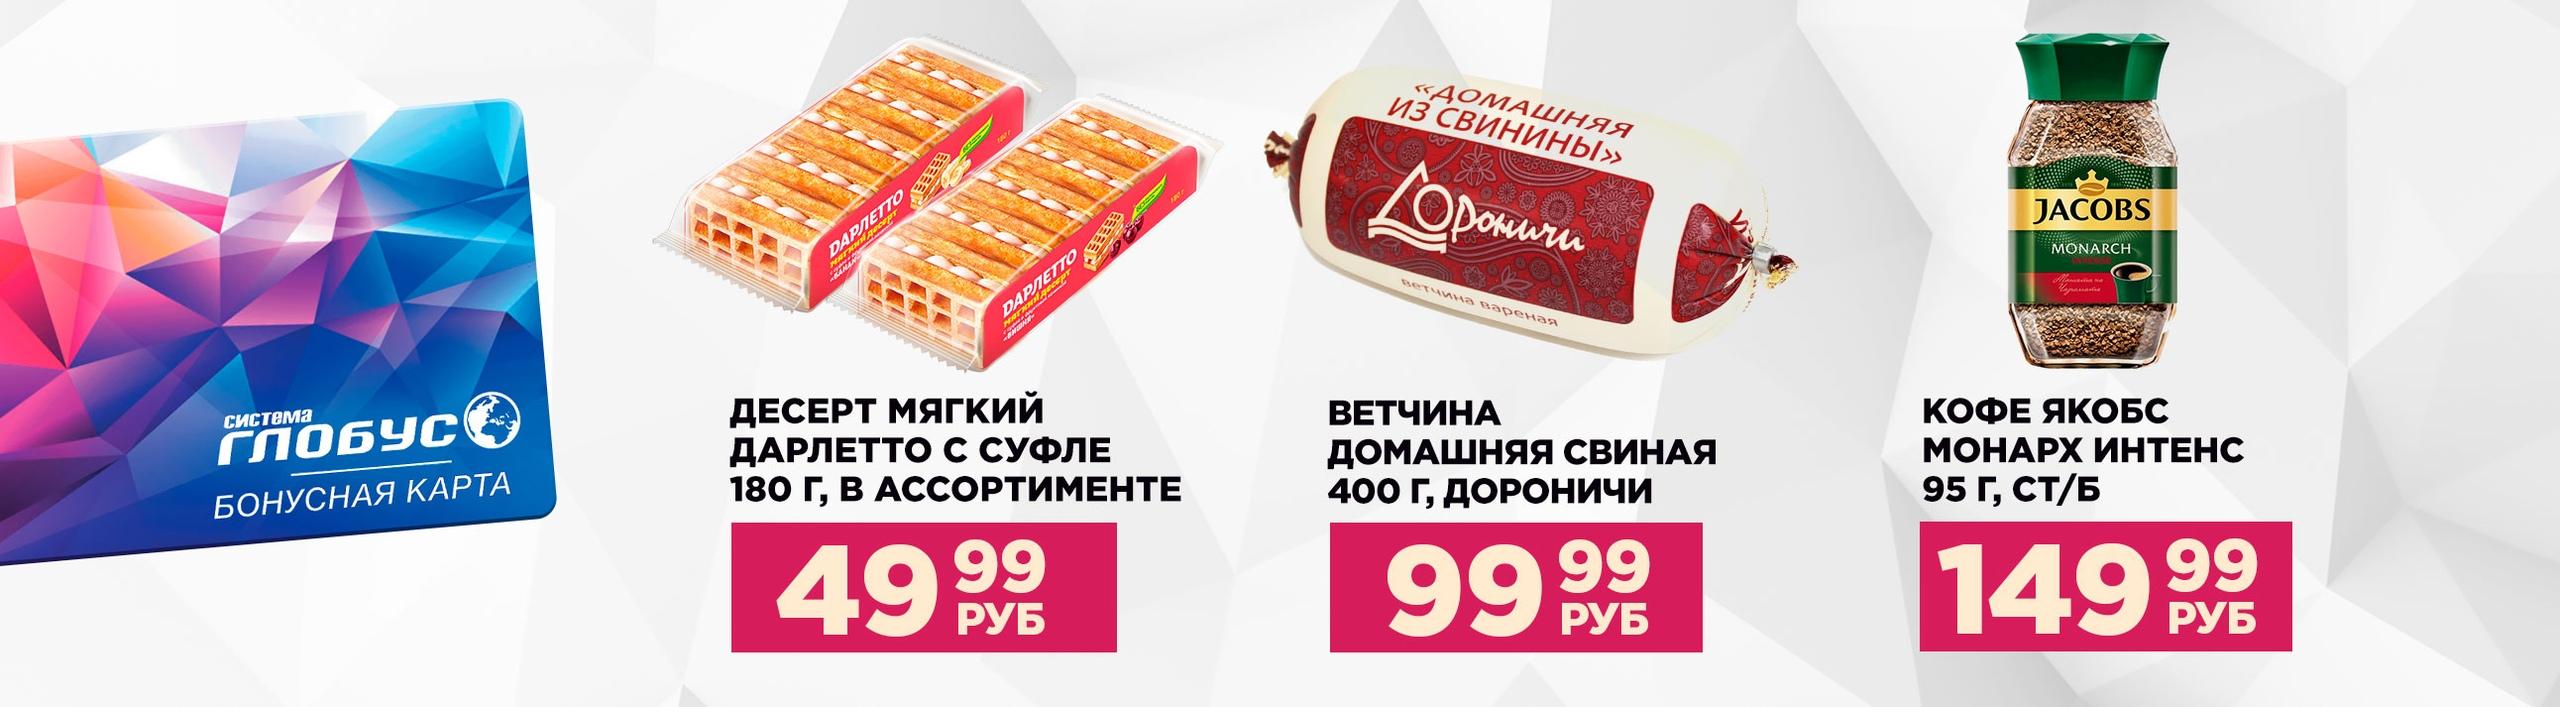 Кафе «Масленица» - Вконтакте